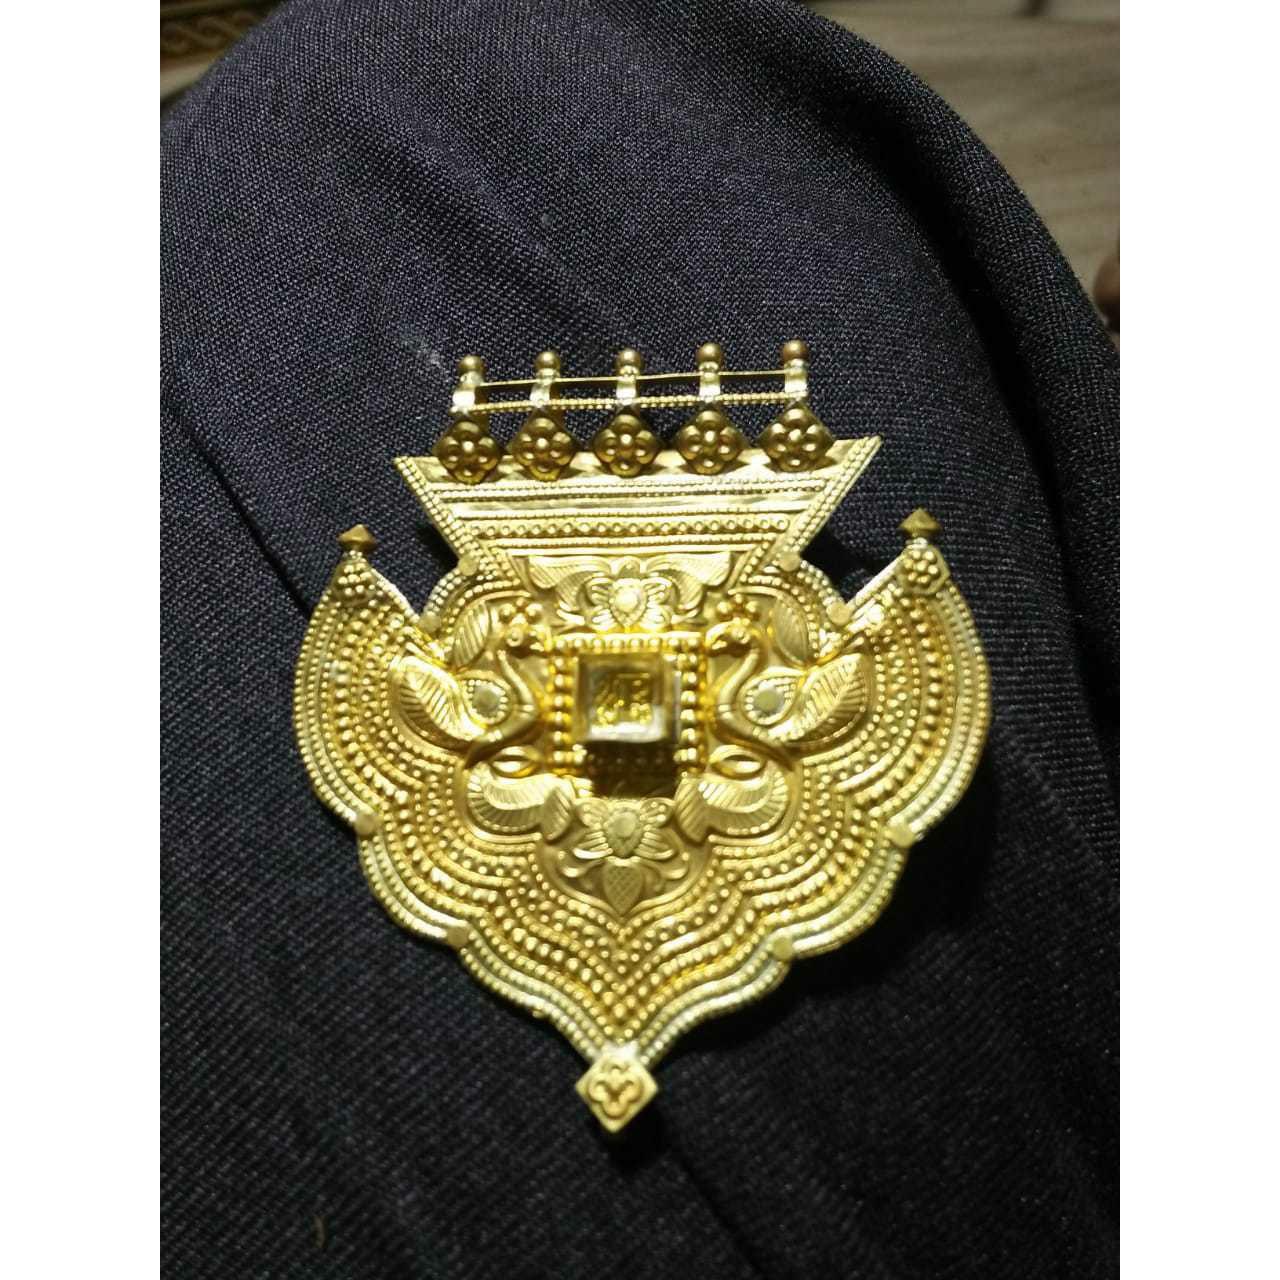 22Kt Gold pendant